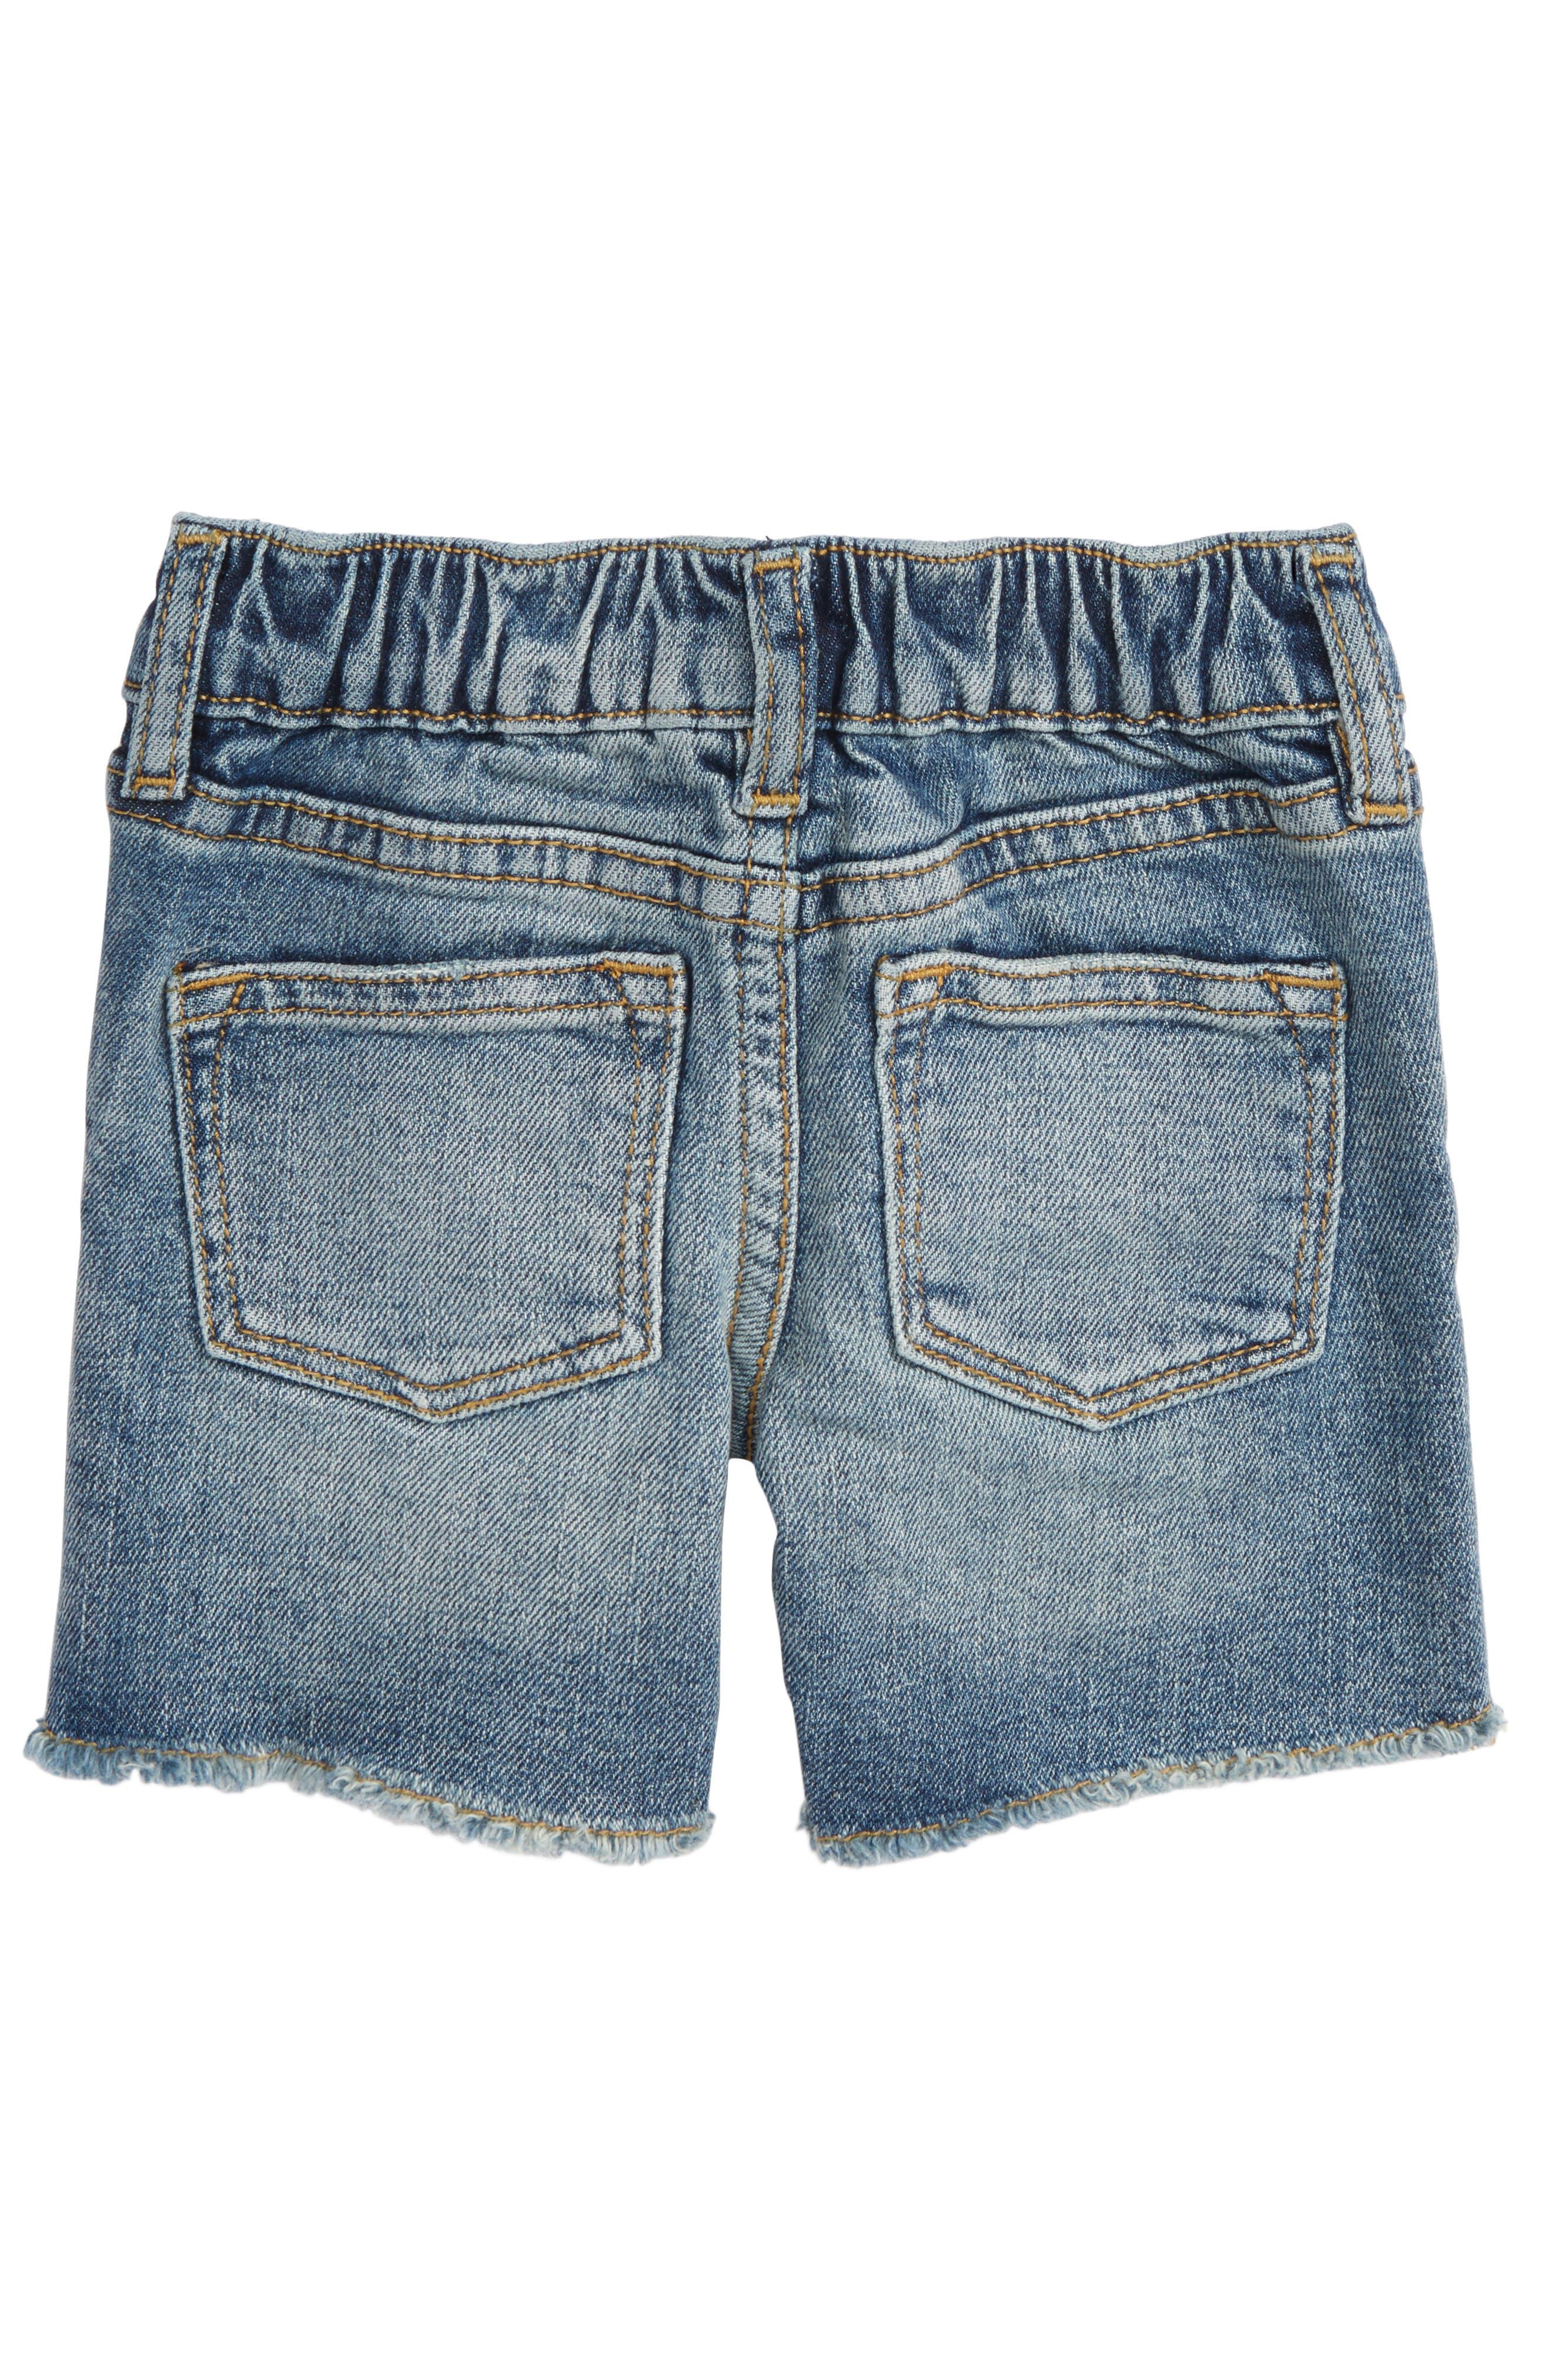 Fairfax Denim Shorts,                             Alternate thumbnail 2, color,                             400